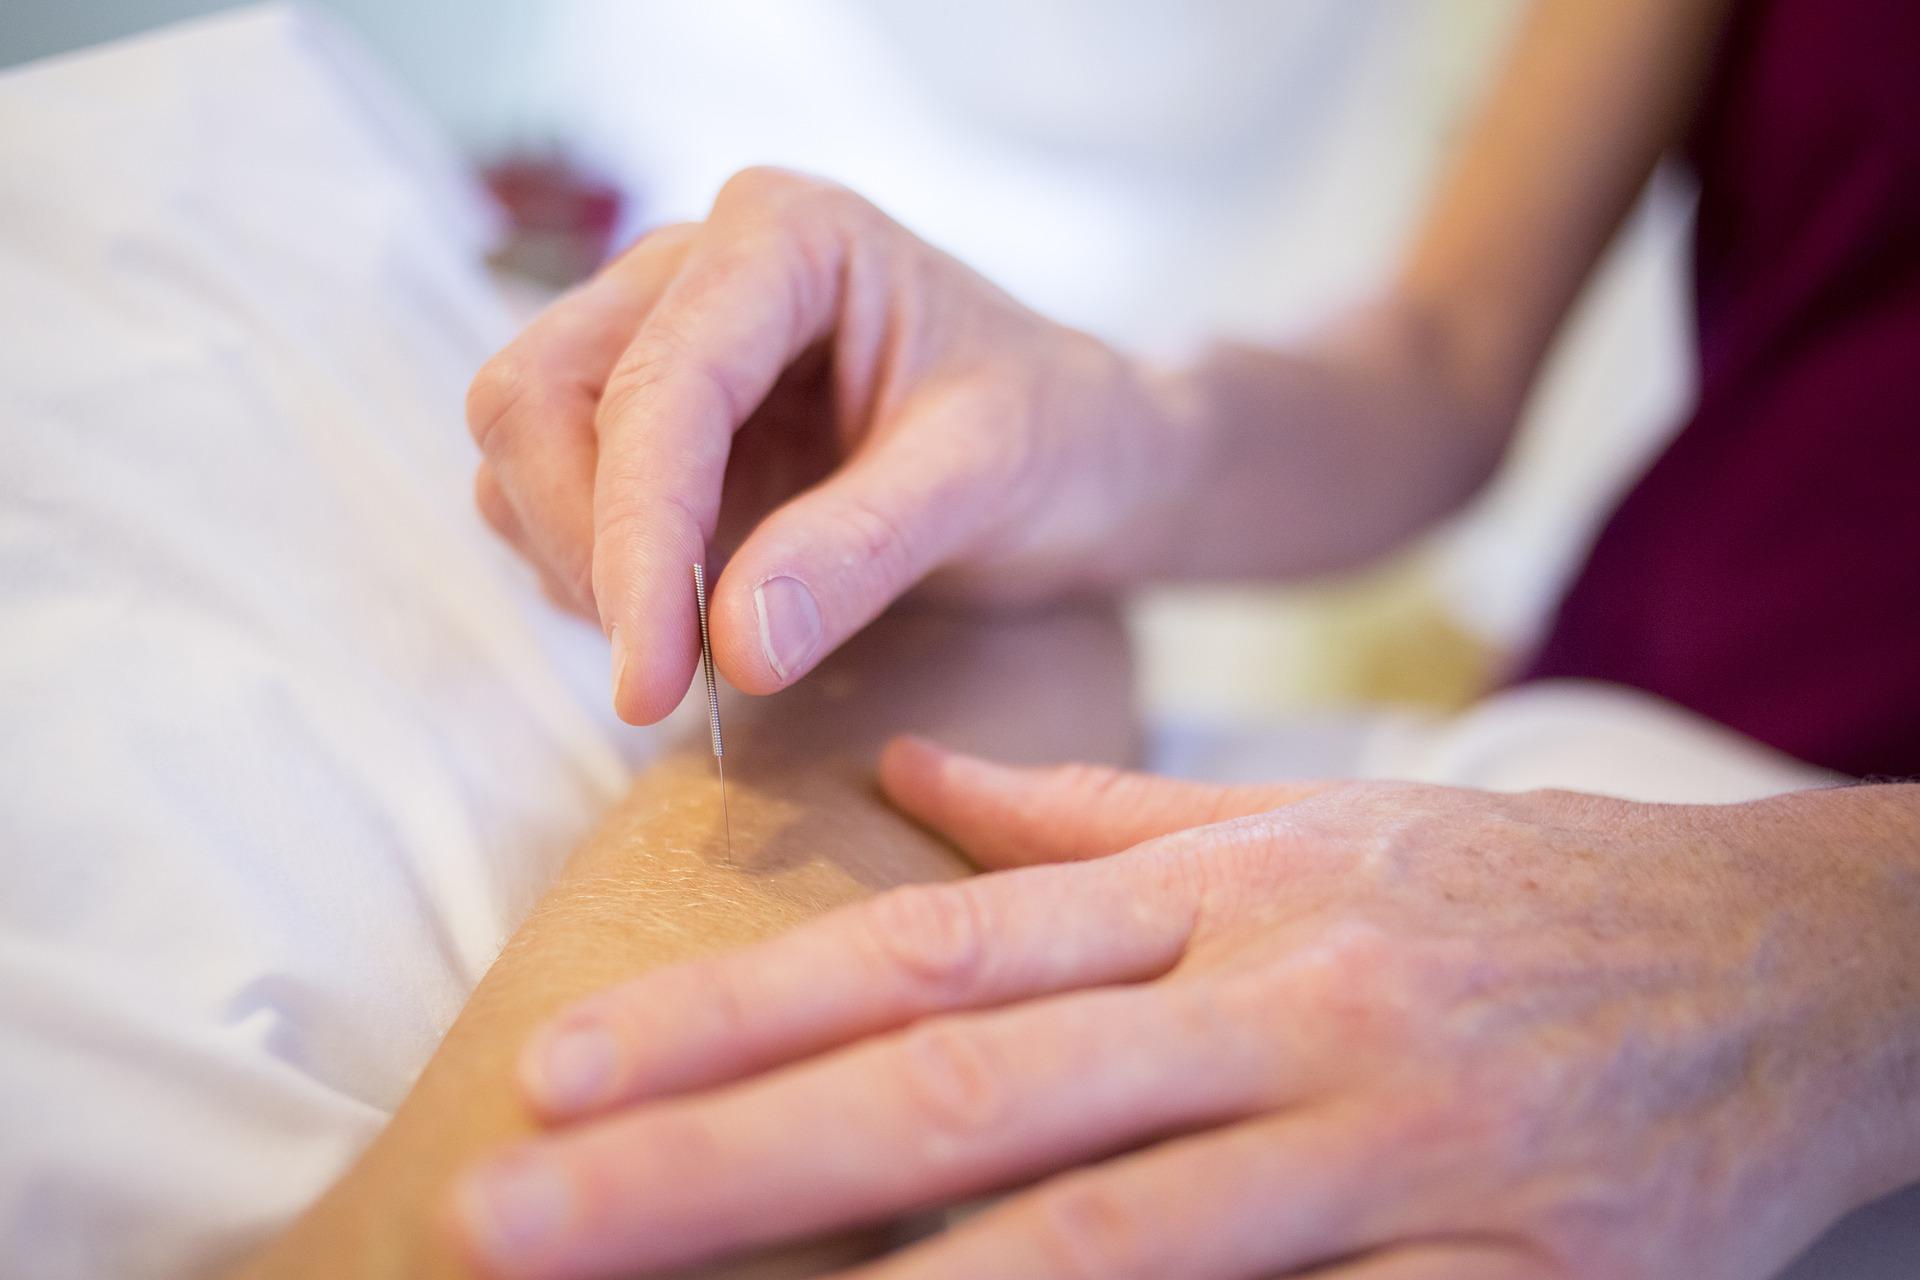 akupunktur behandling ved fysioterapeut